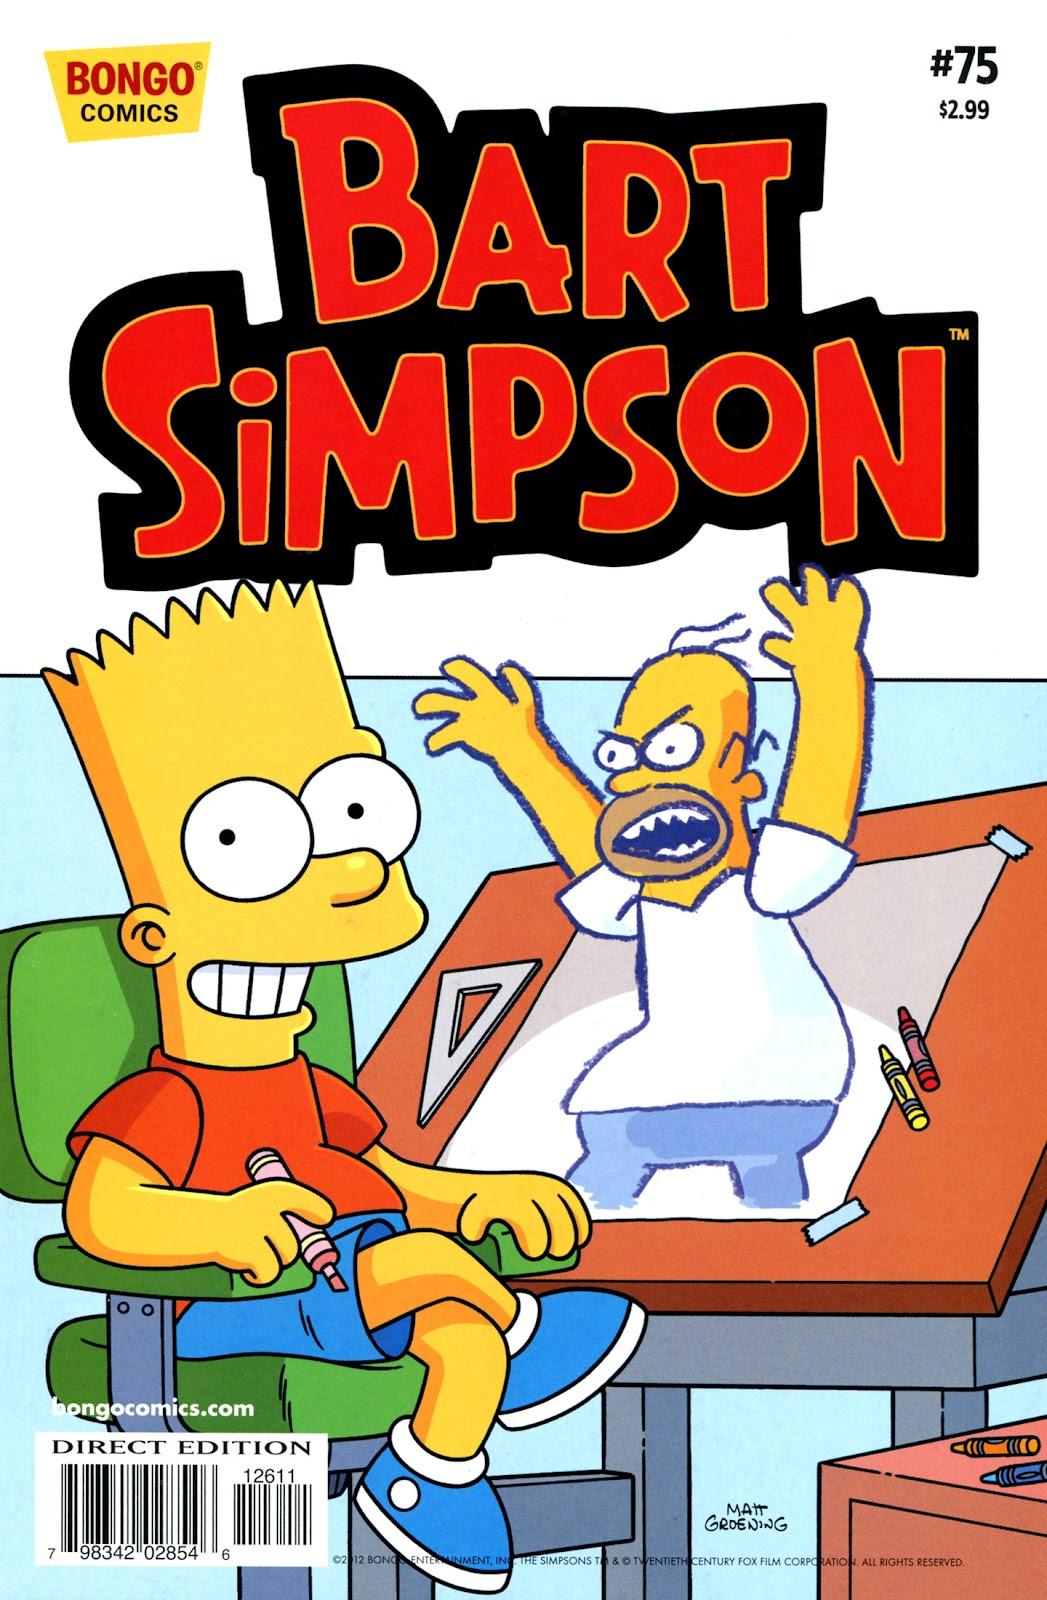 Simpsons Comics Presents Bart Simpson 75 Page 1